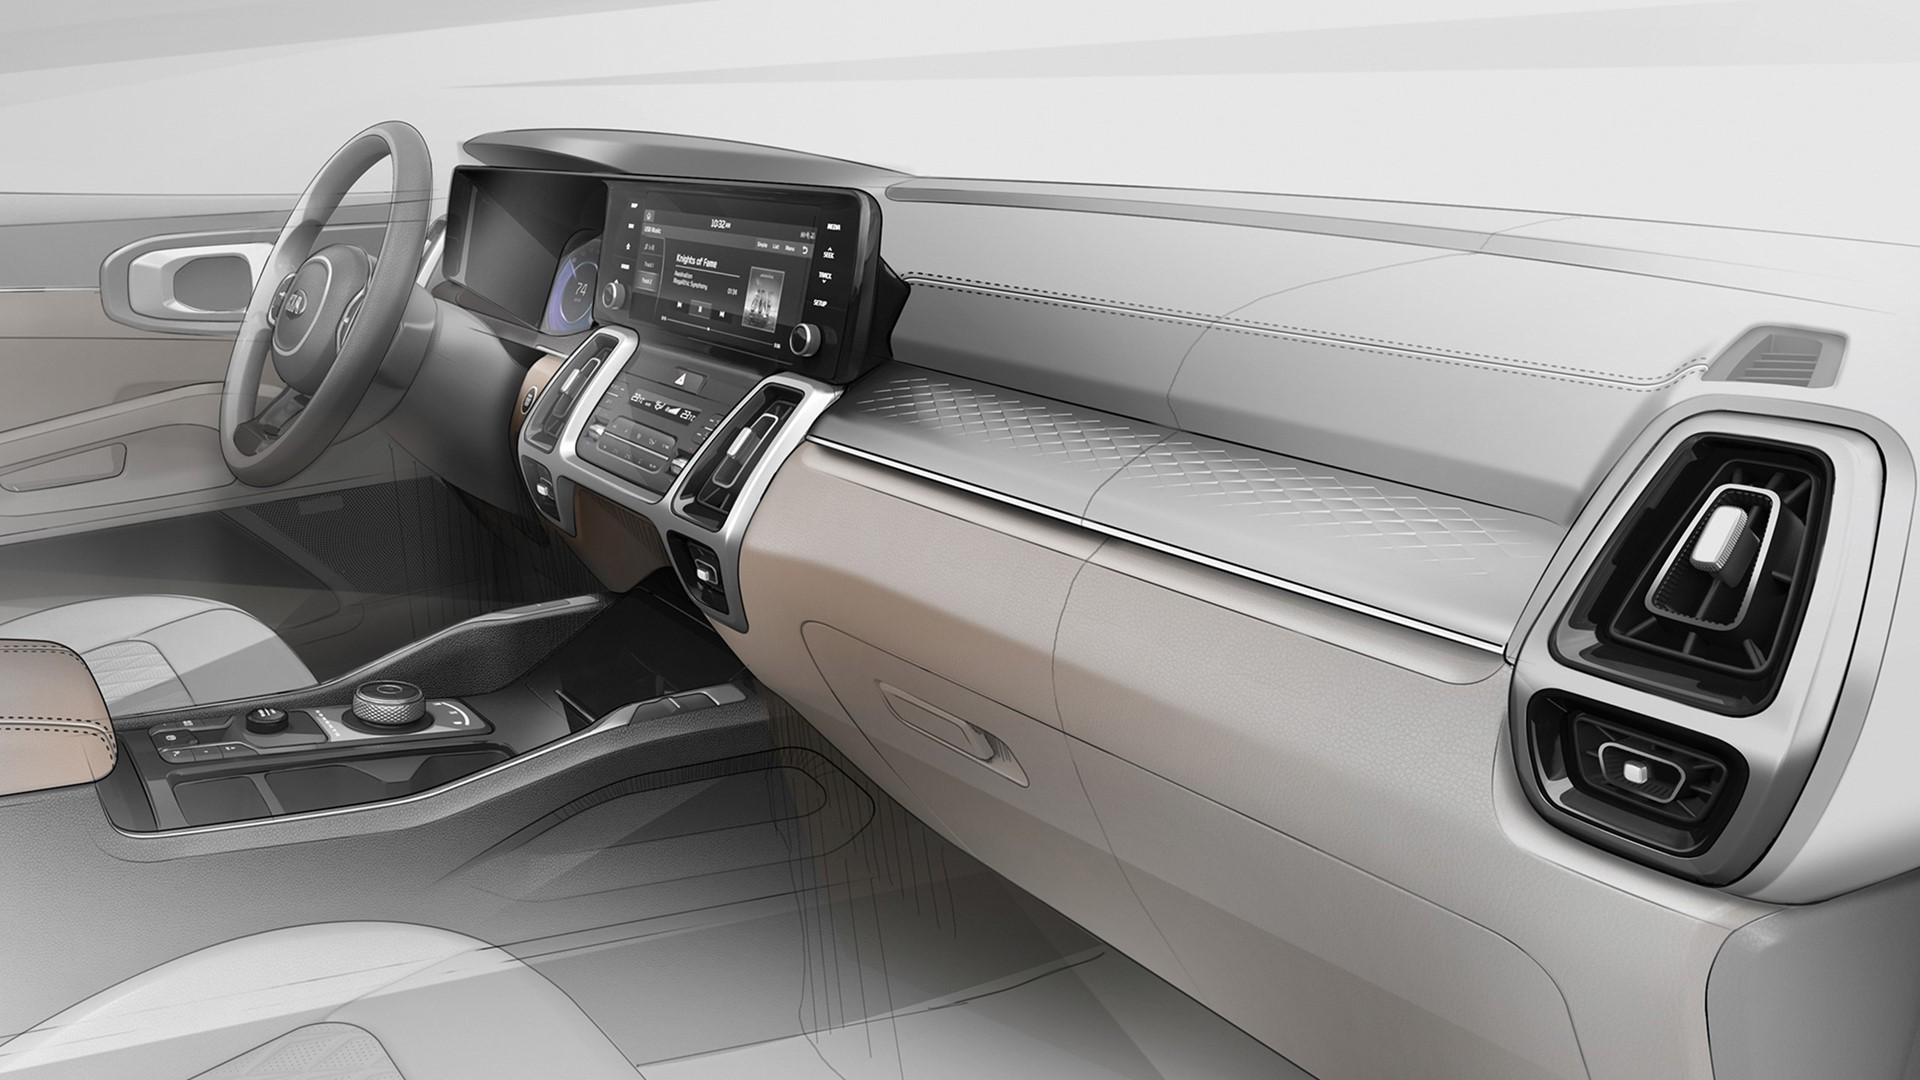 Powerful, progressive and versatile: the new Kia Sorento - Image 3